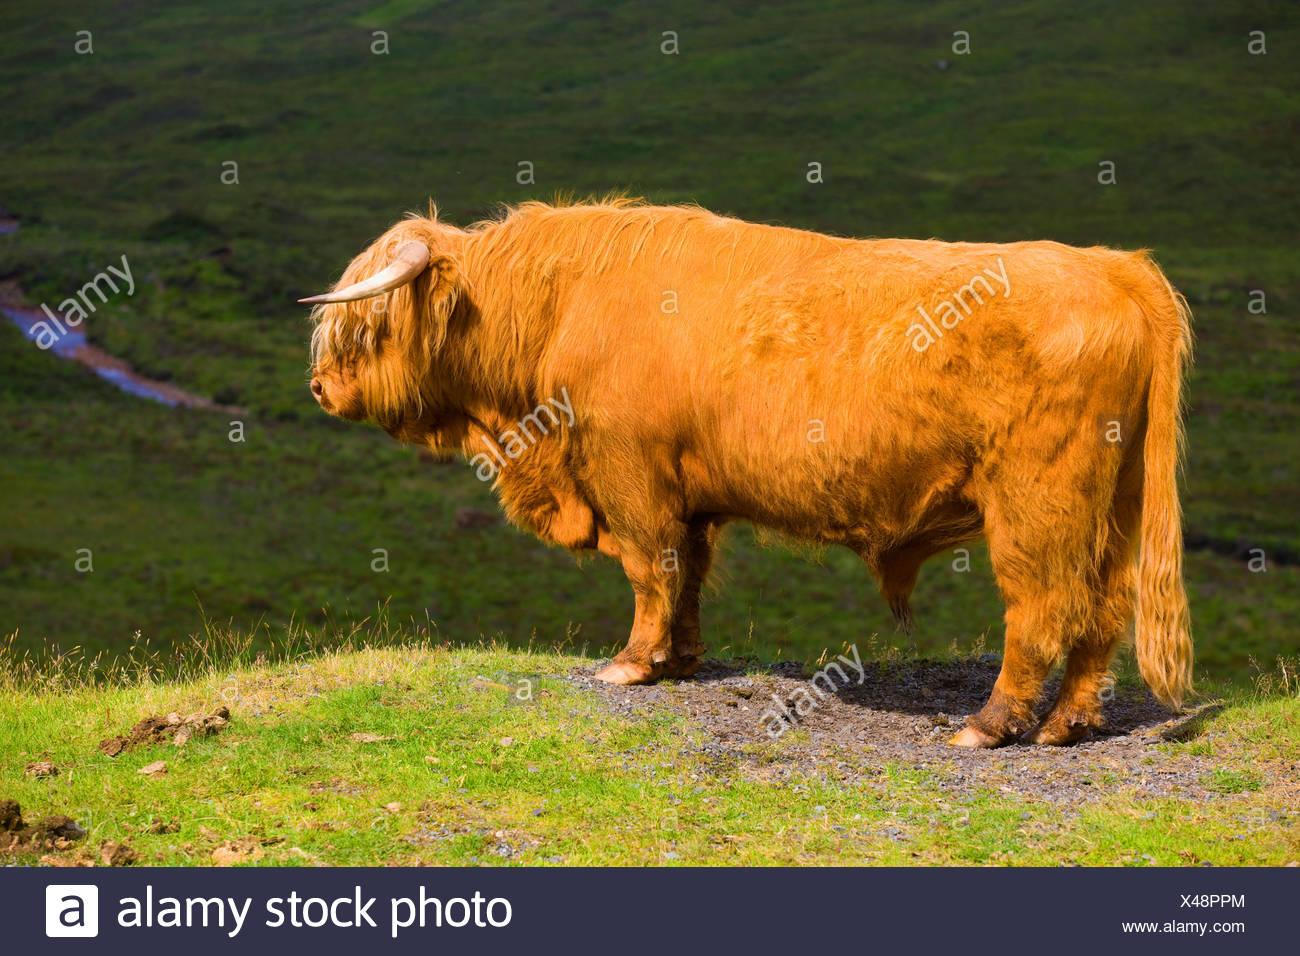 Sconser, highland bovine animal, Great Britain, Scotland, Europe, mammal, domestic animal, pet, Scottish highland bovine animal, - Stock Image